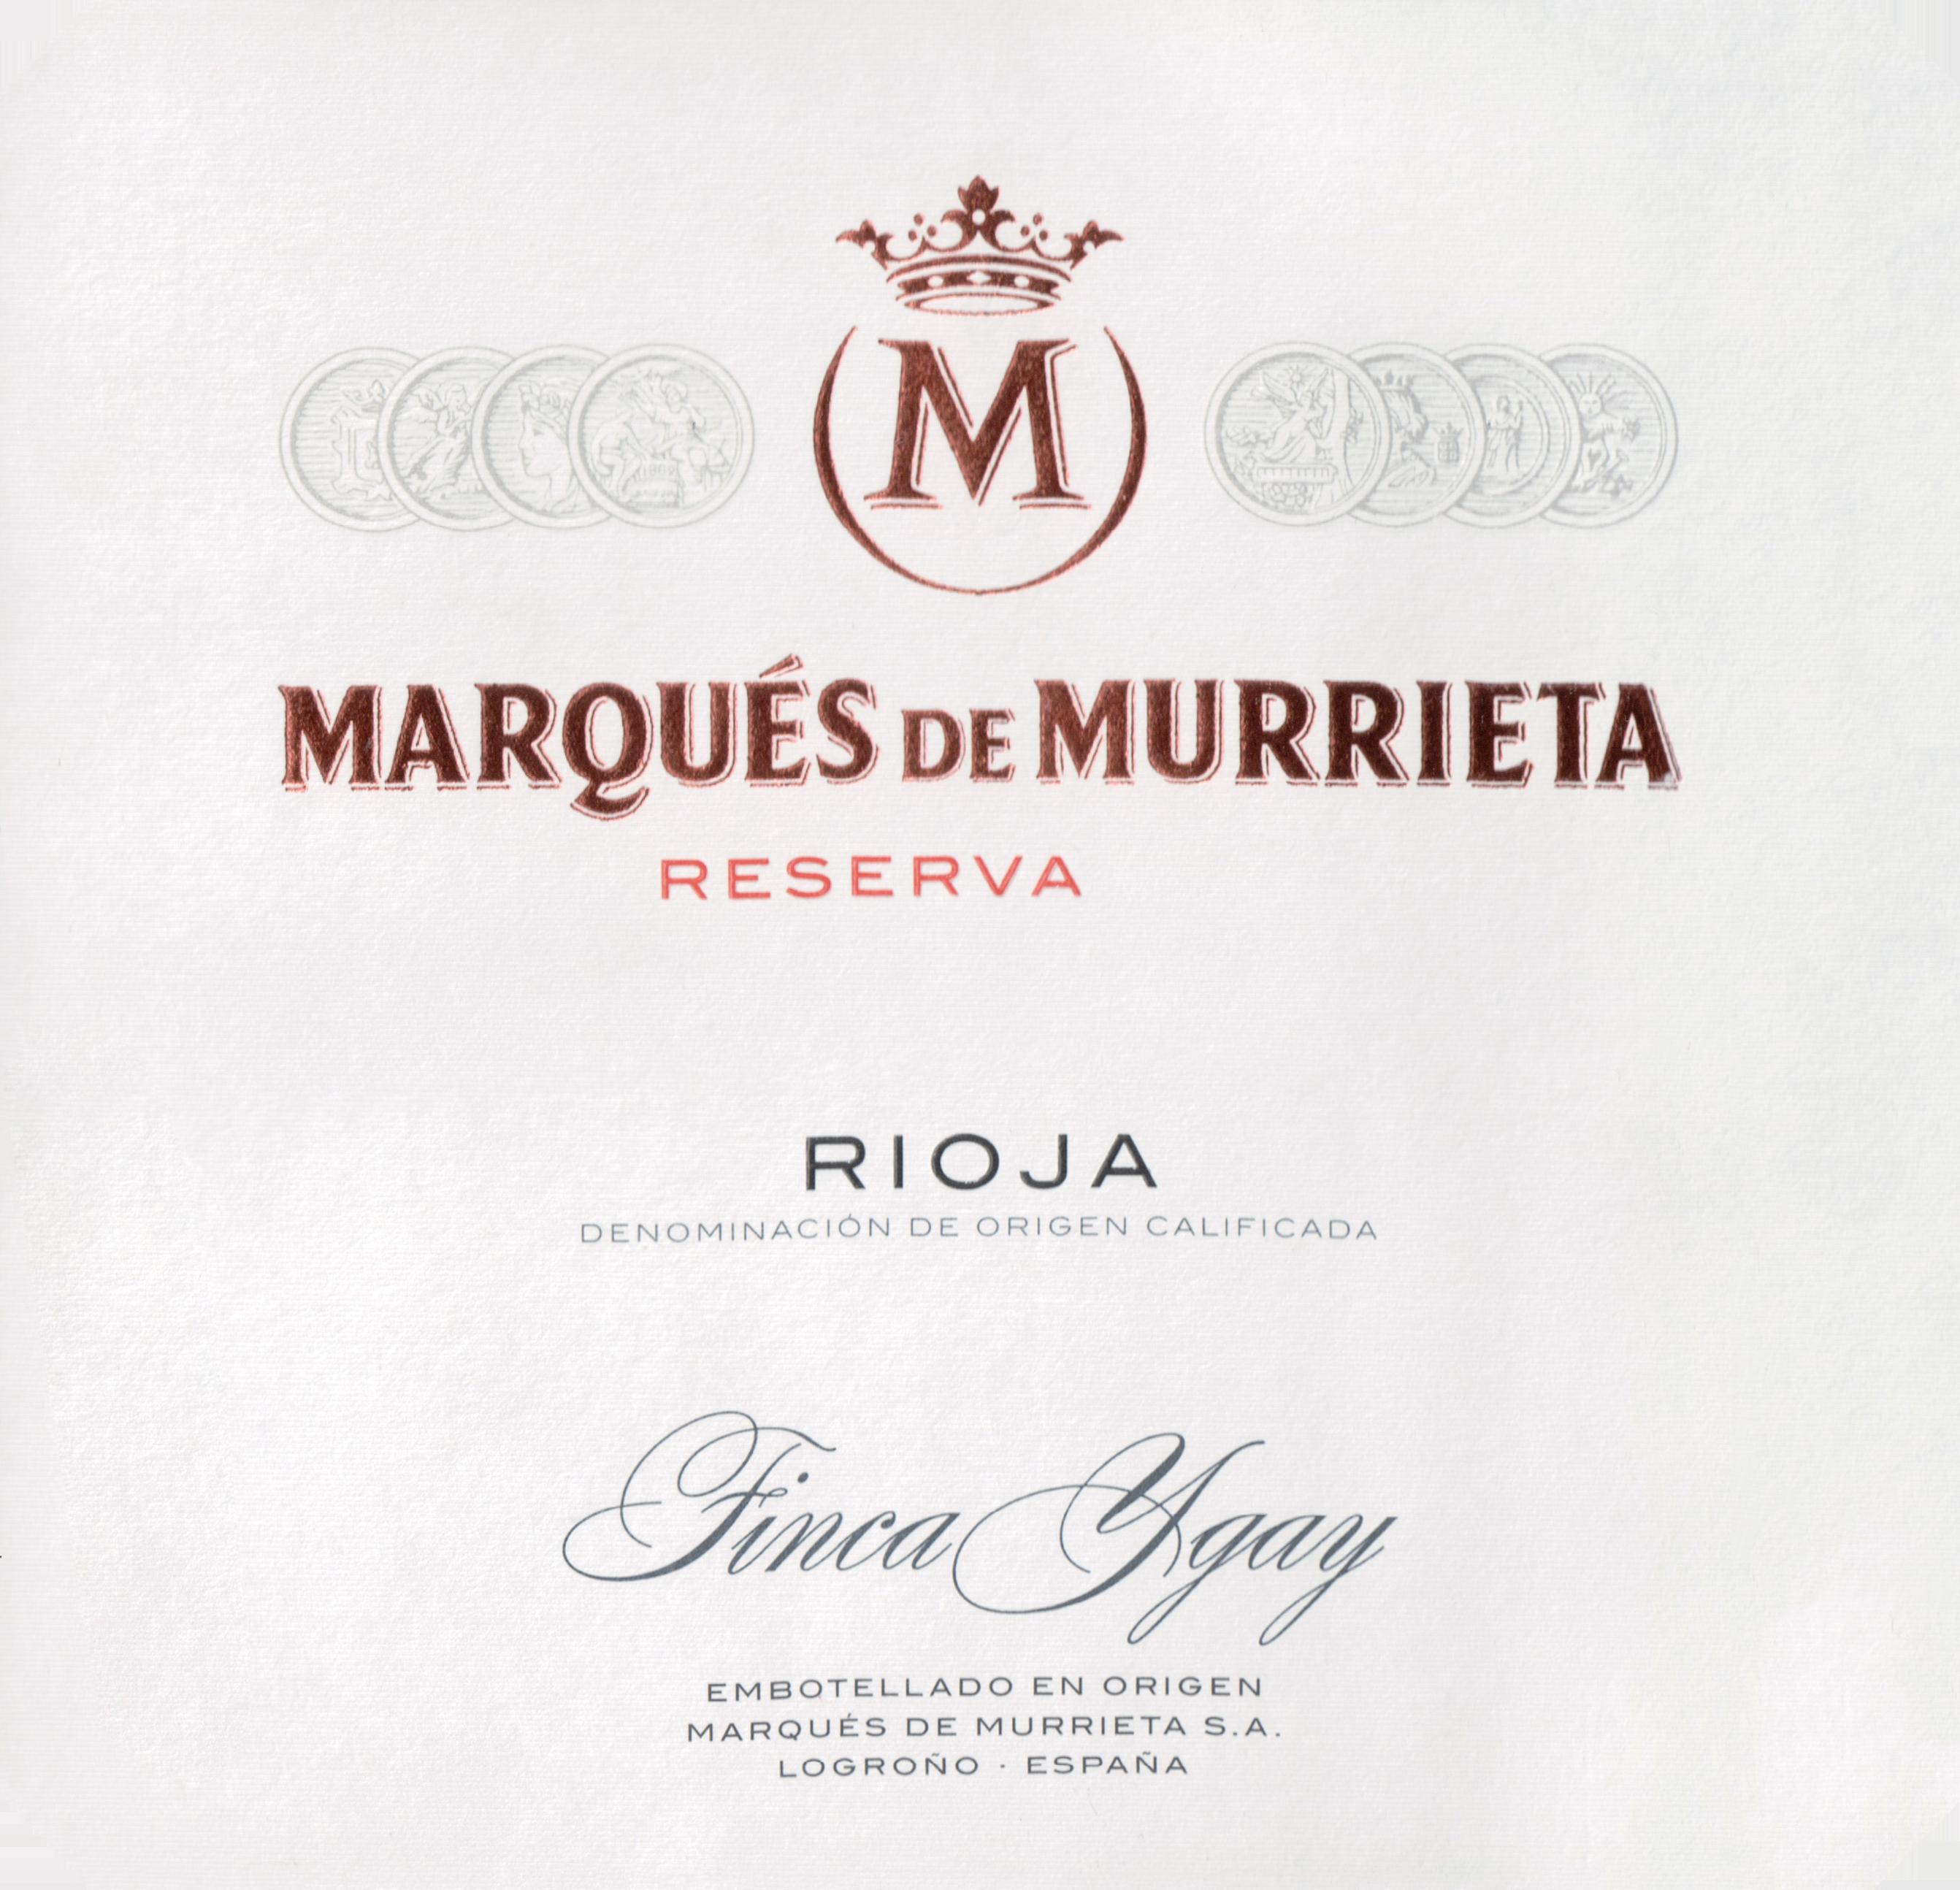 Marques De Murrieta Reserva Rioja 2016